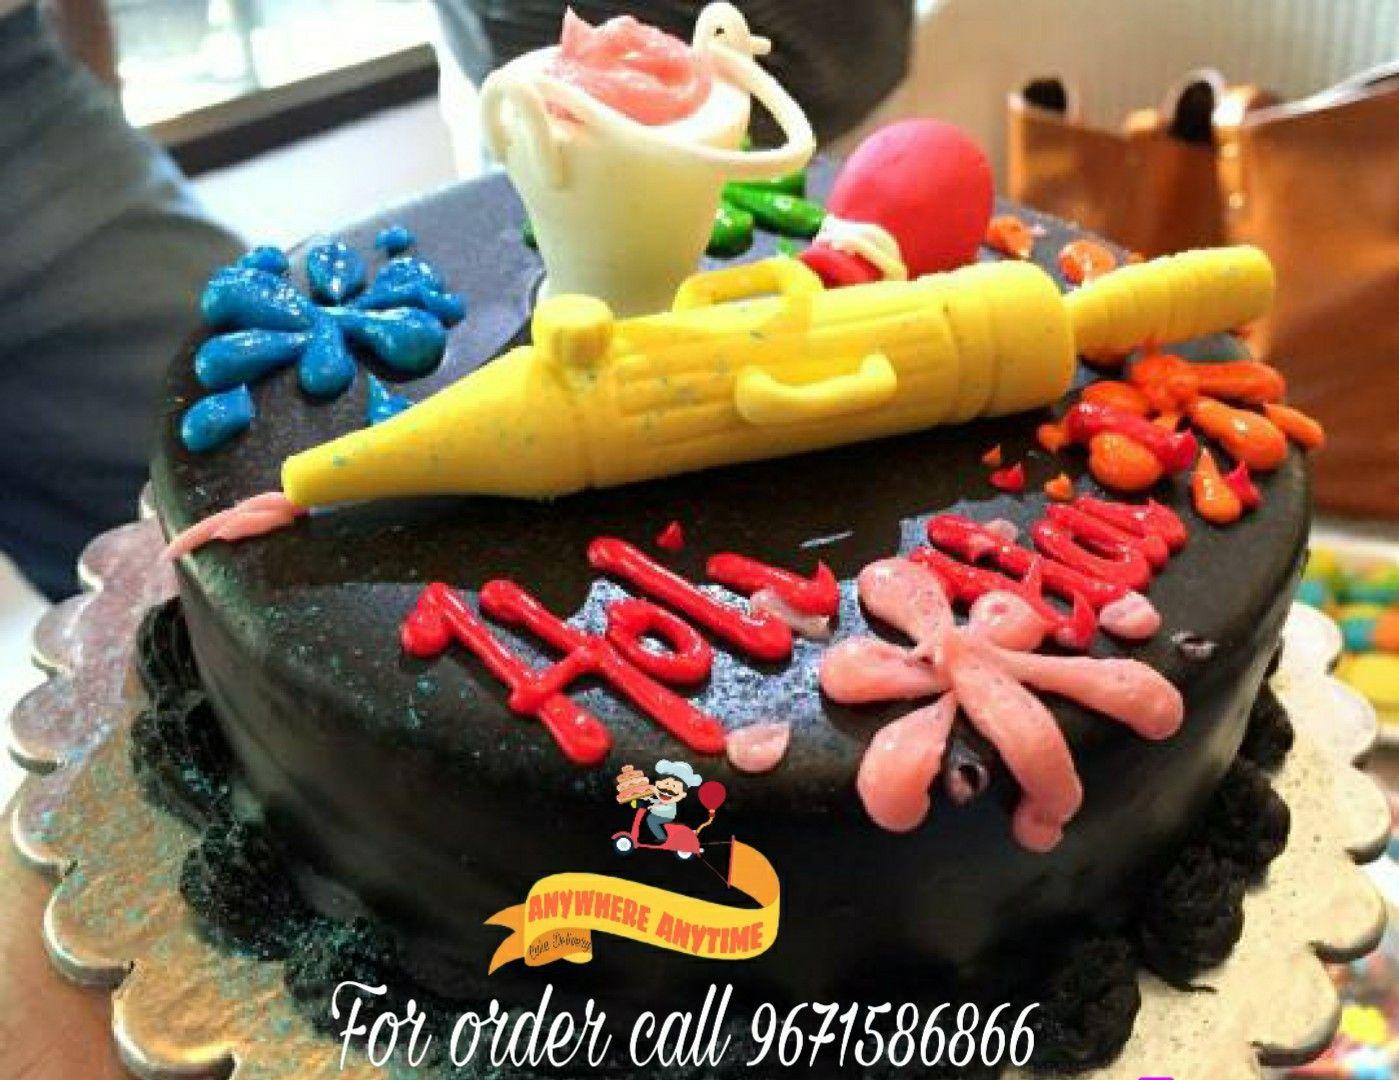 Holi Special Fondant Cake Cake Decorating With Fondant Cake Cake Delivery